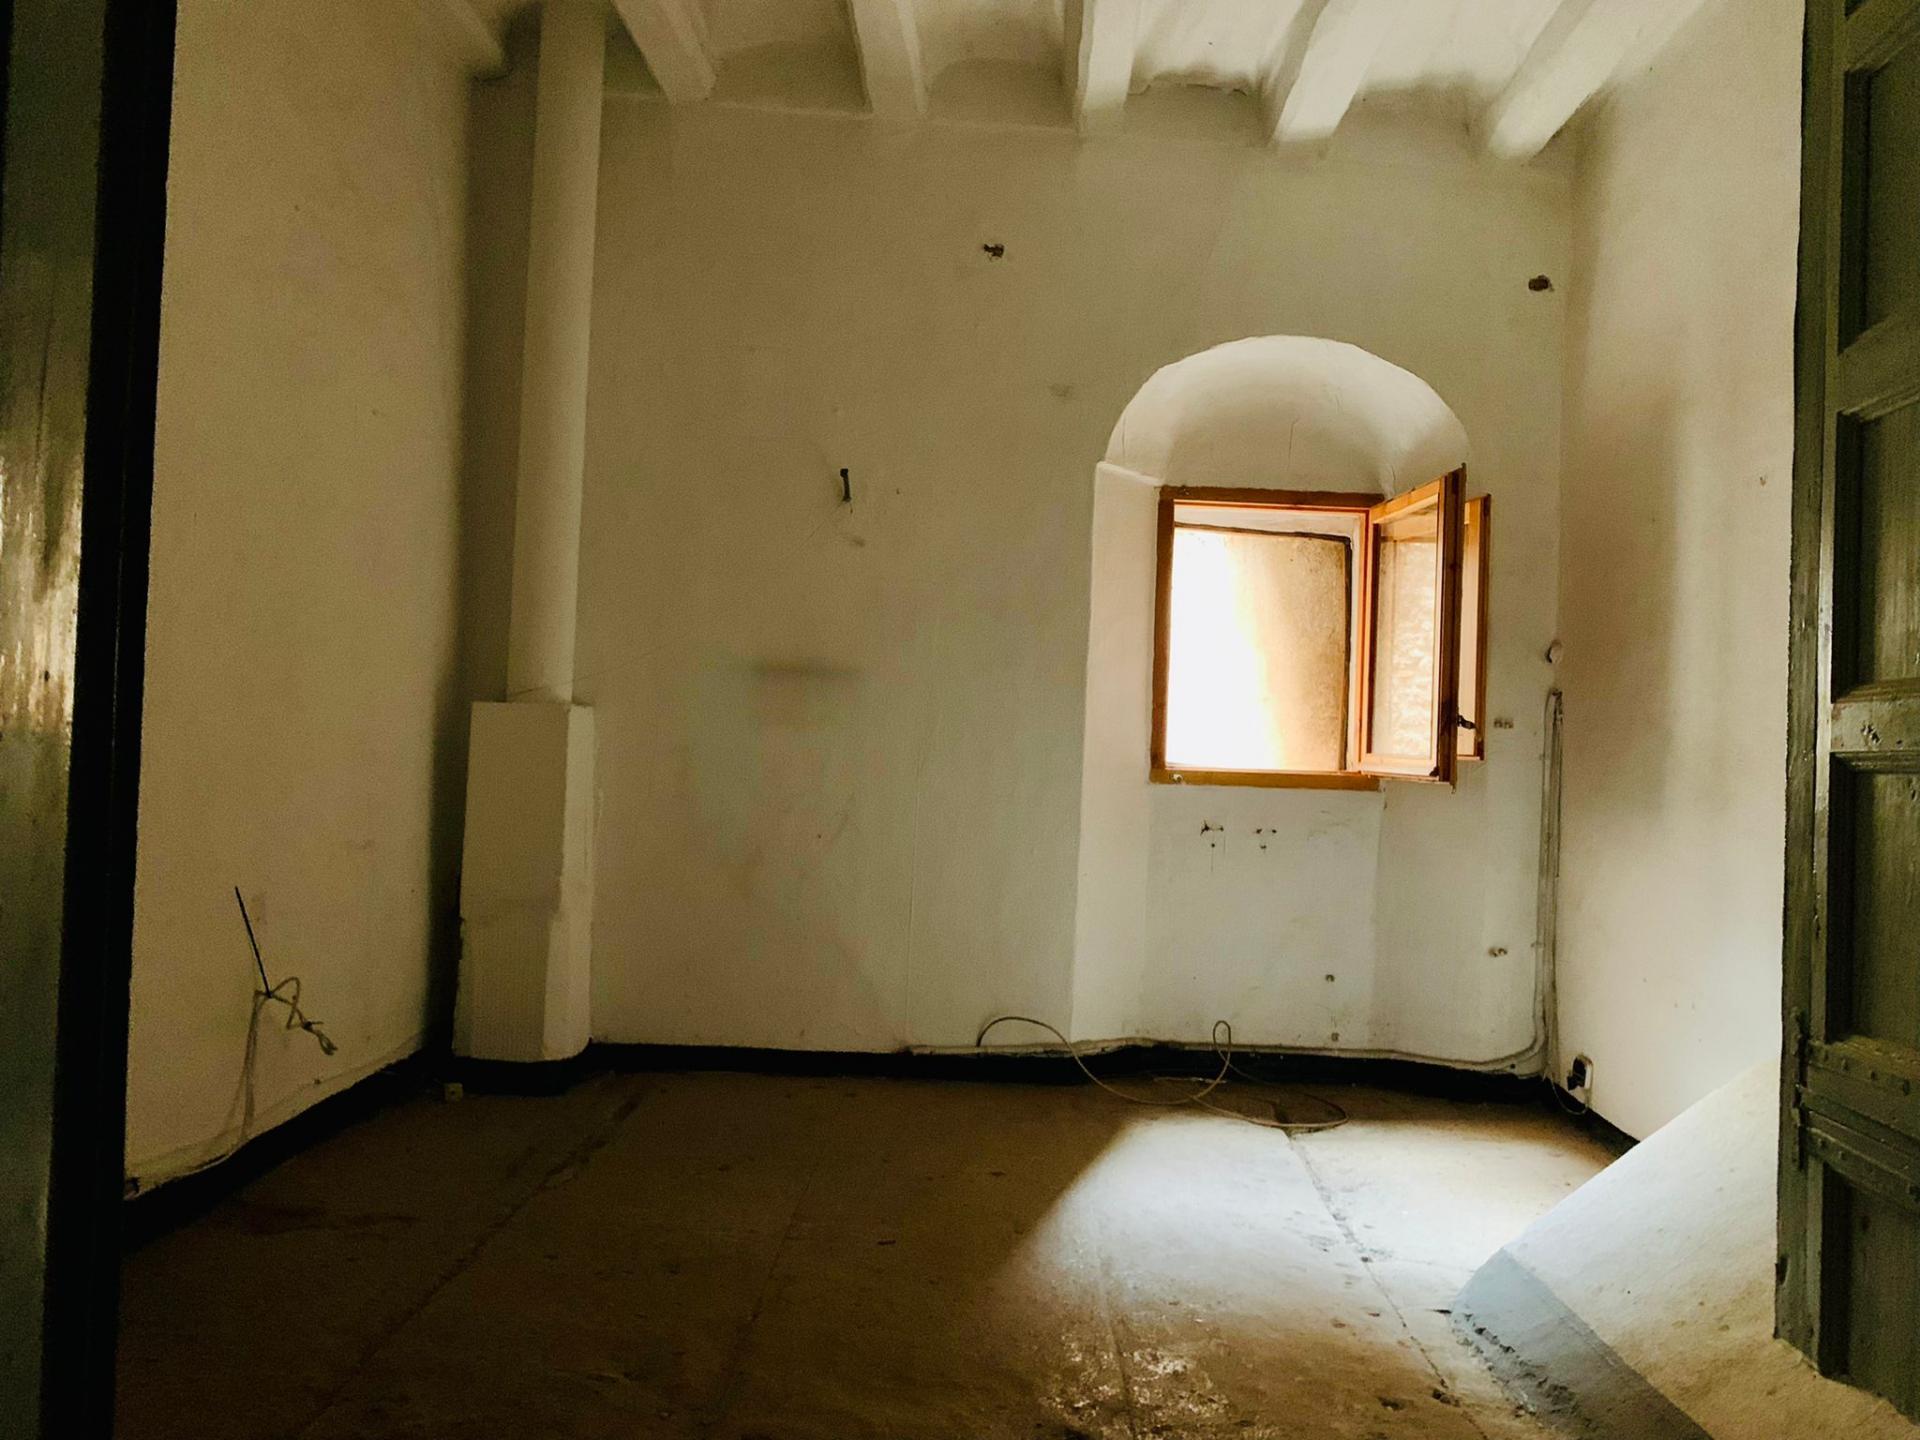 Foto 11 (V-750-2021) - Inmueble en  Venda a Sant Pere de Riudebitlles